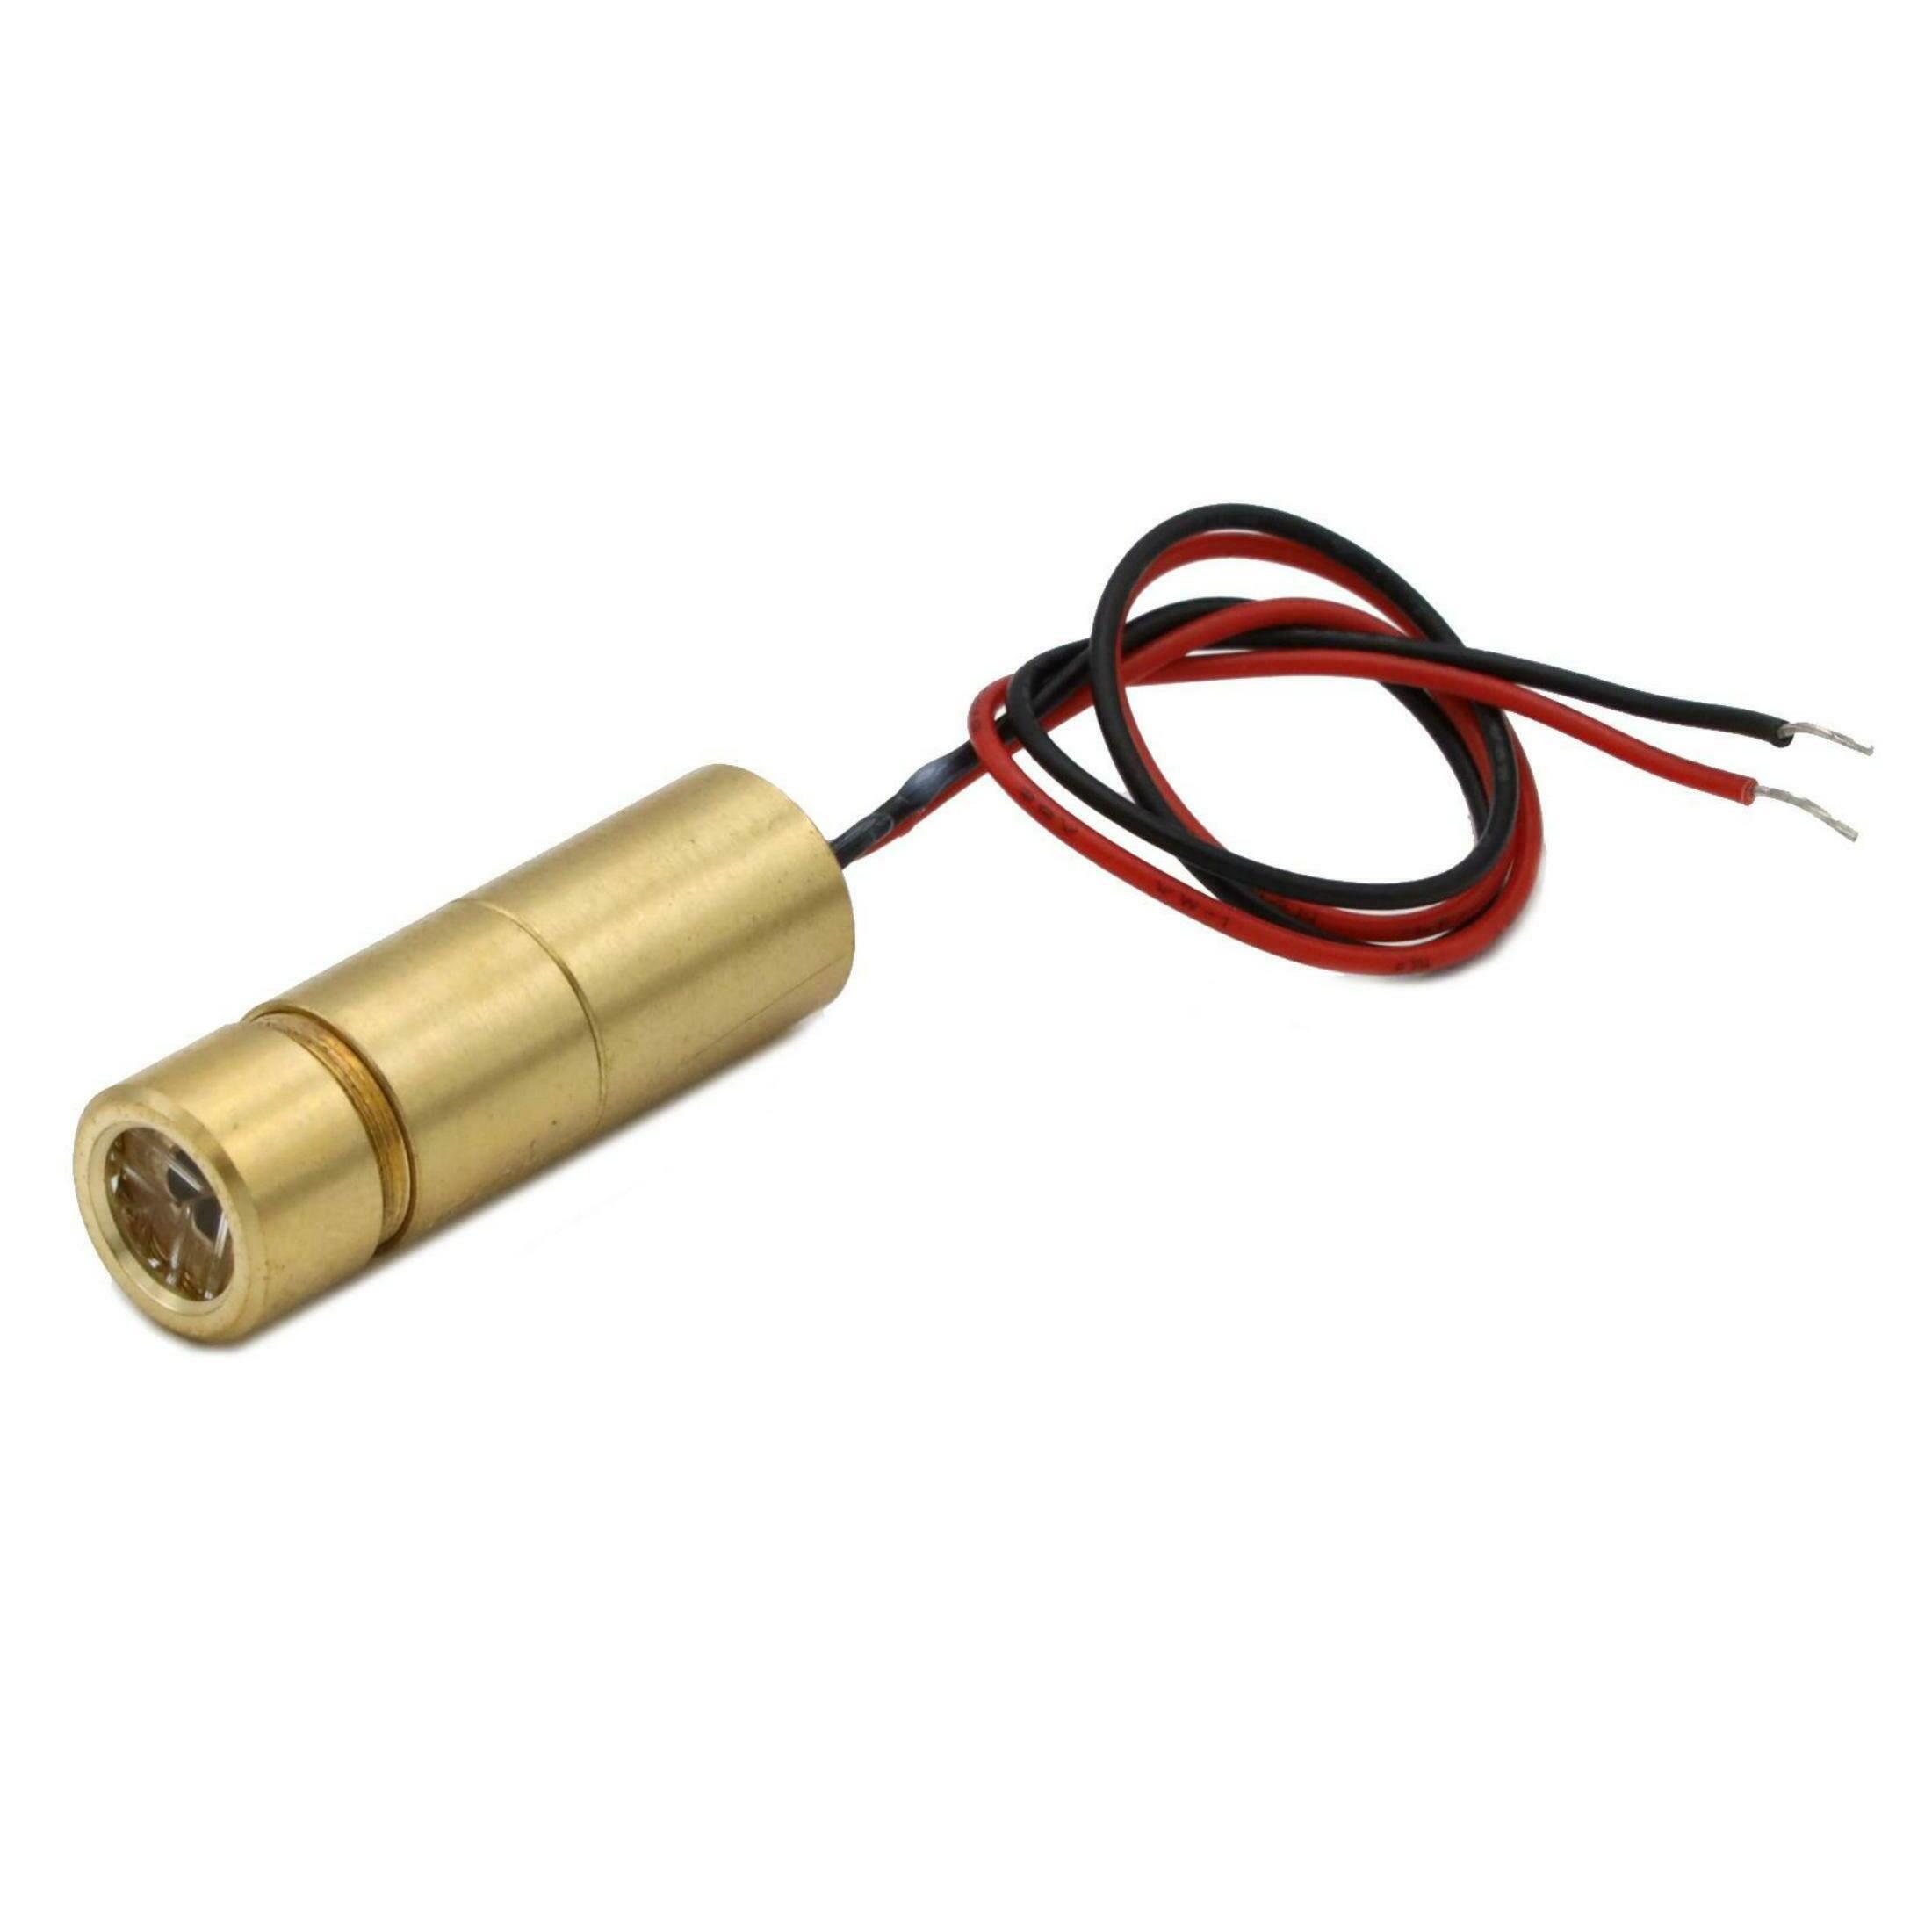 Laserfuchs Laser CB635-5-5(9x26)60-ADJ